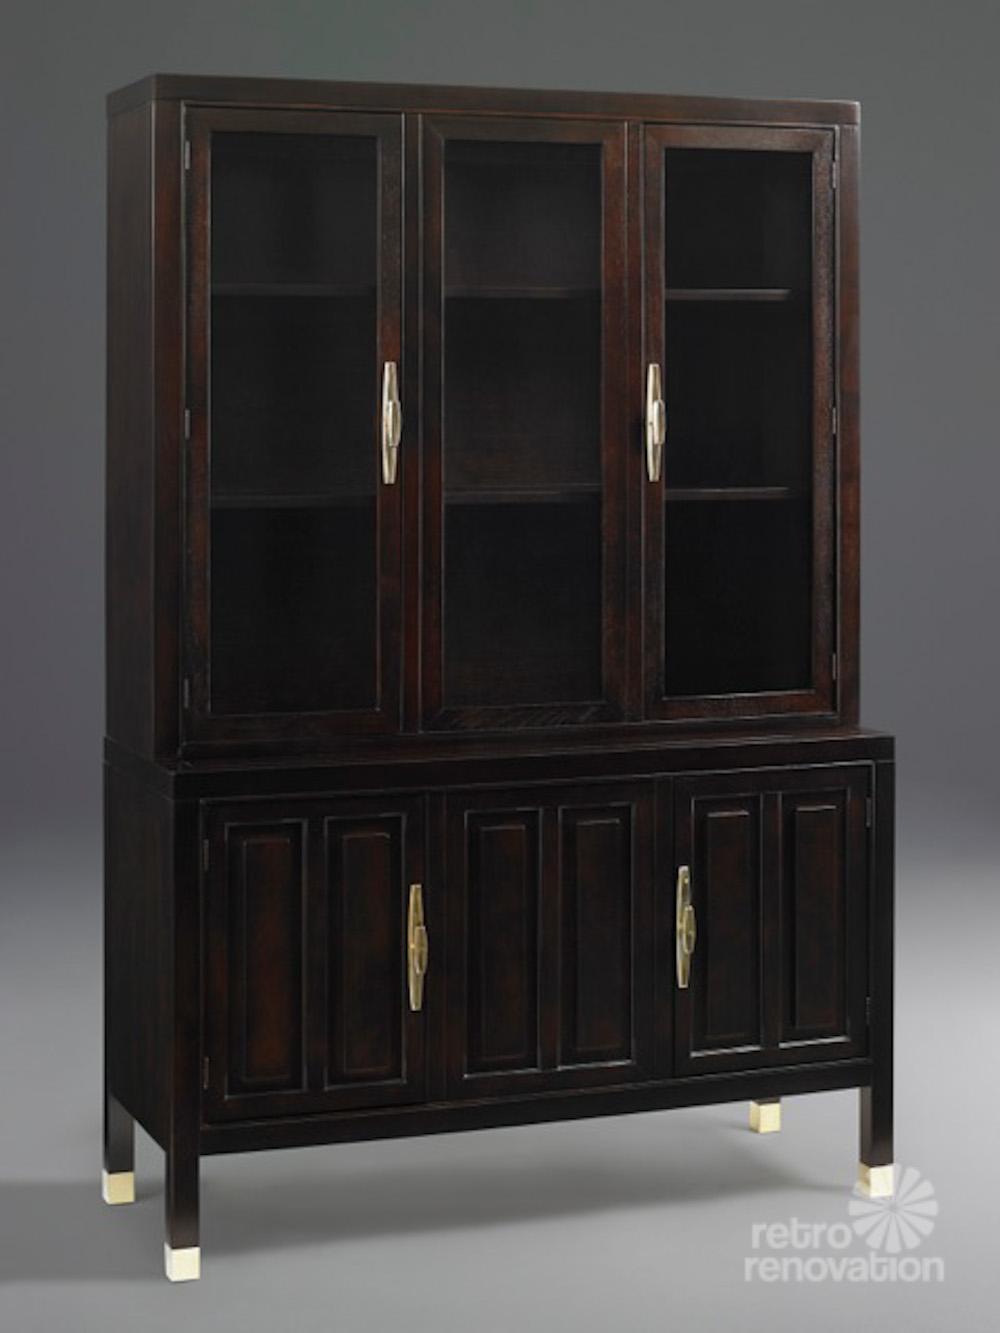 Restored Vintage Stanley Furniture Heritage Collection